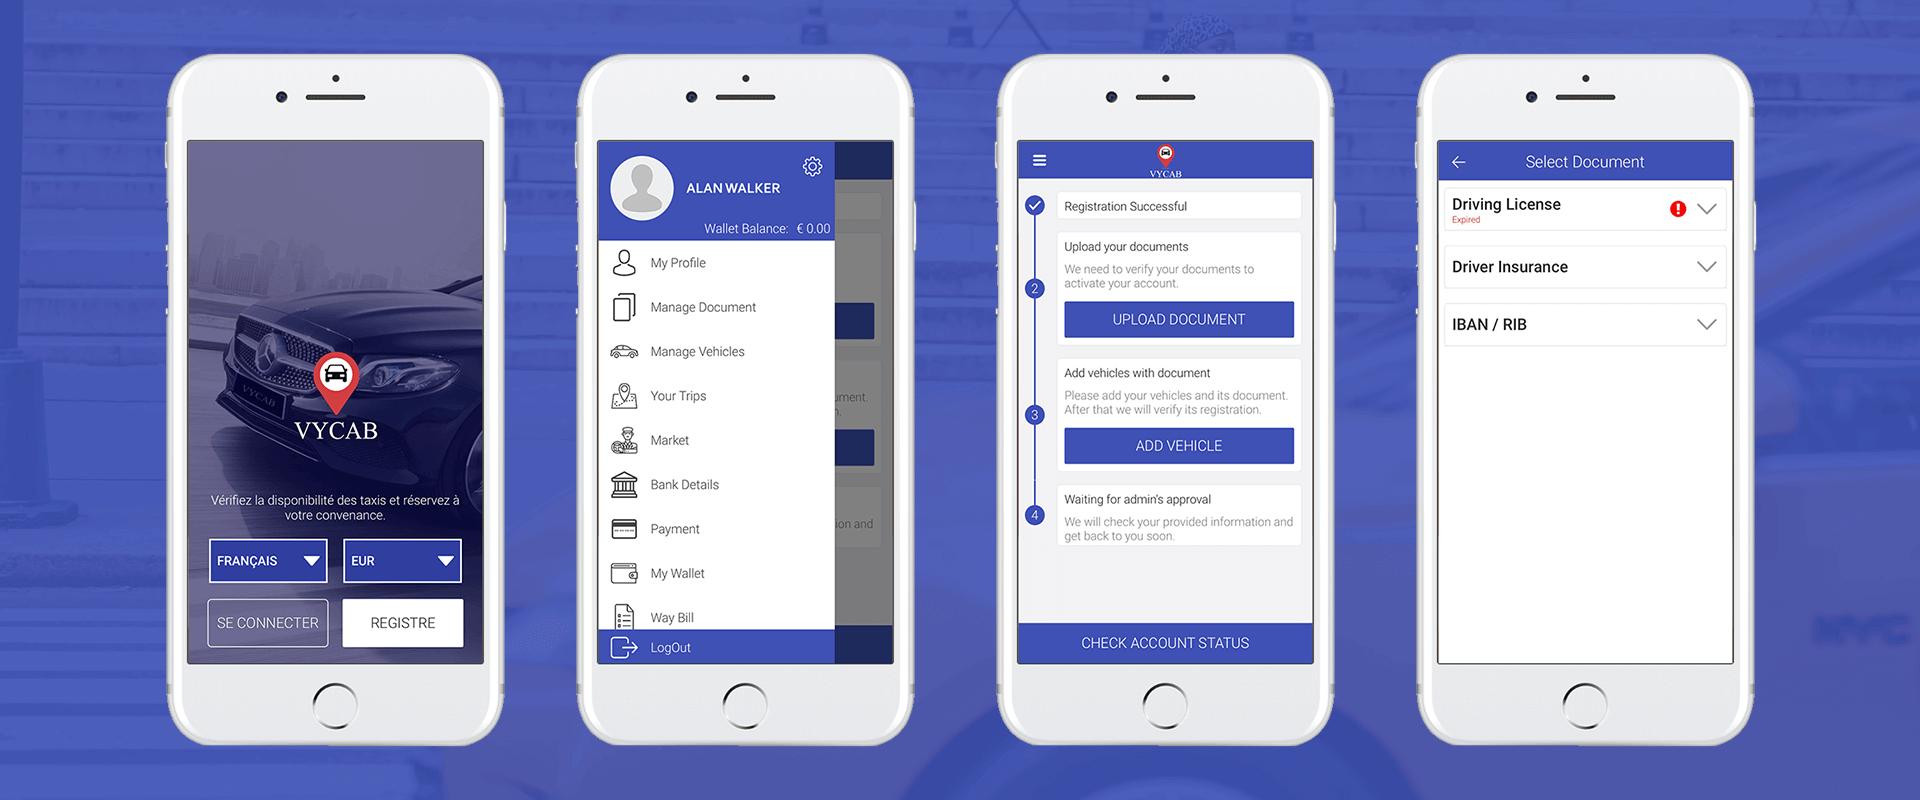 vycab app iphone design